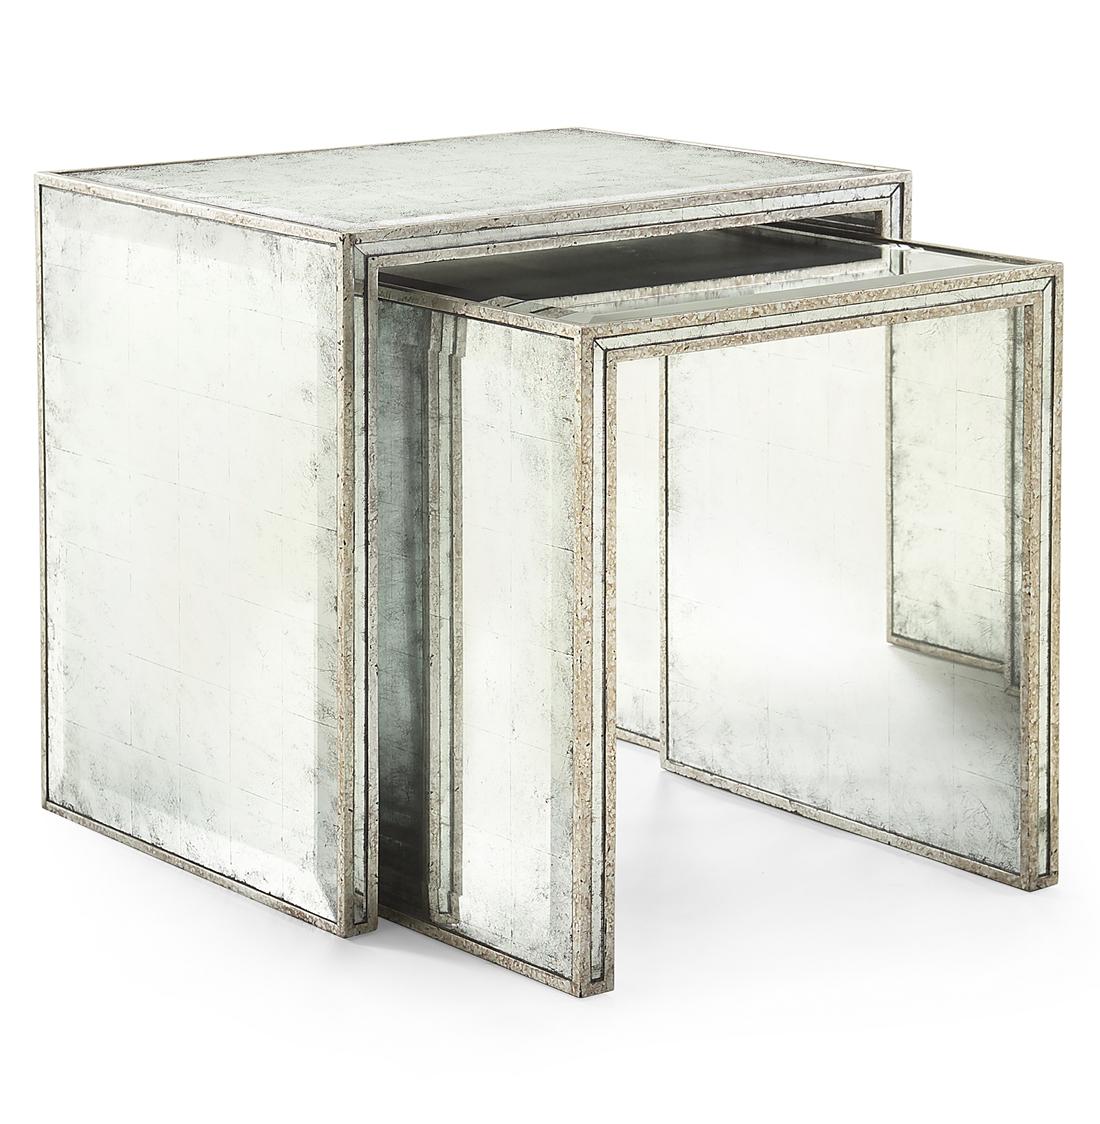 Jasmine Hollywood Regency Silver Leaf Mirror Nesting Side End Table - Set of 2